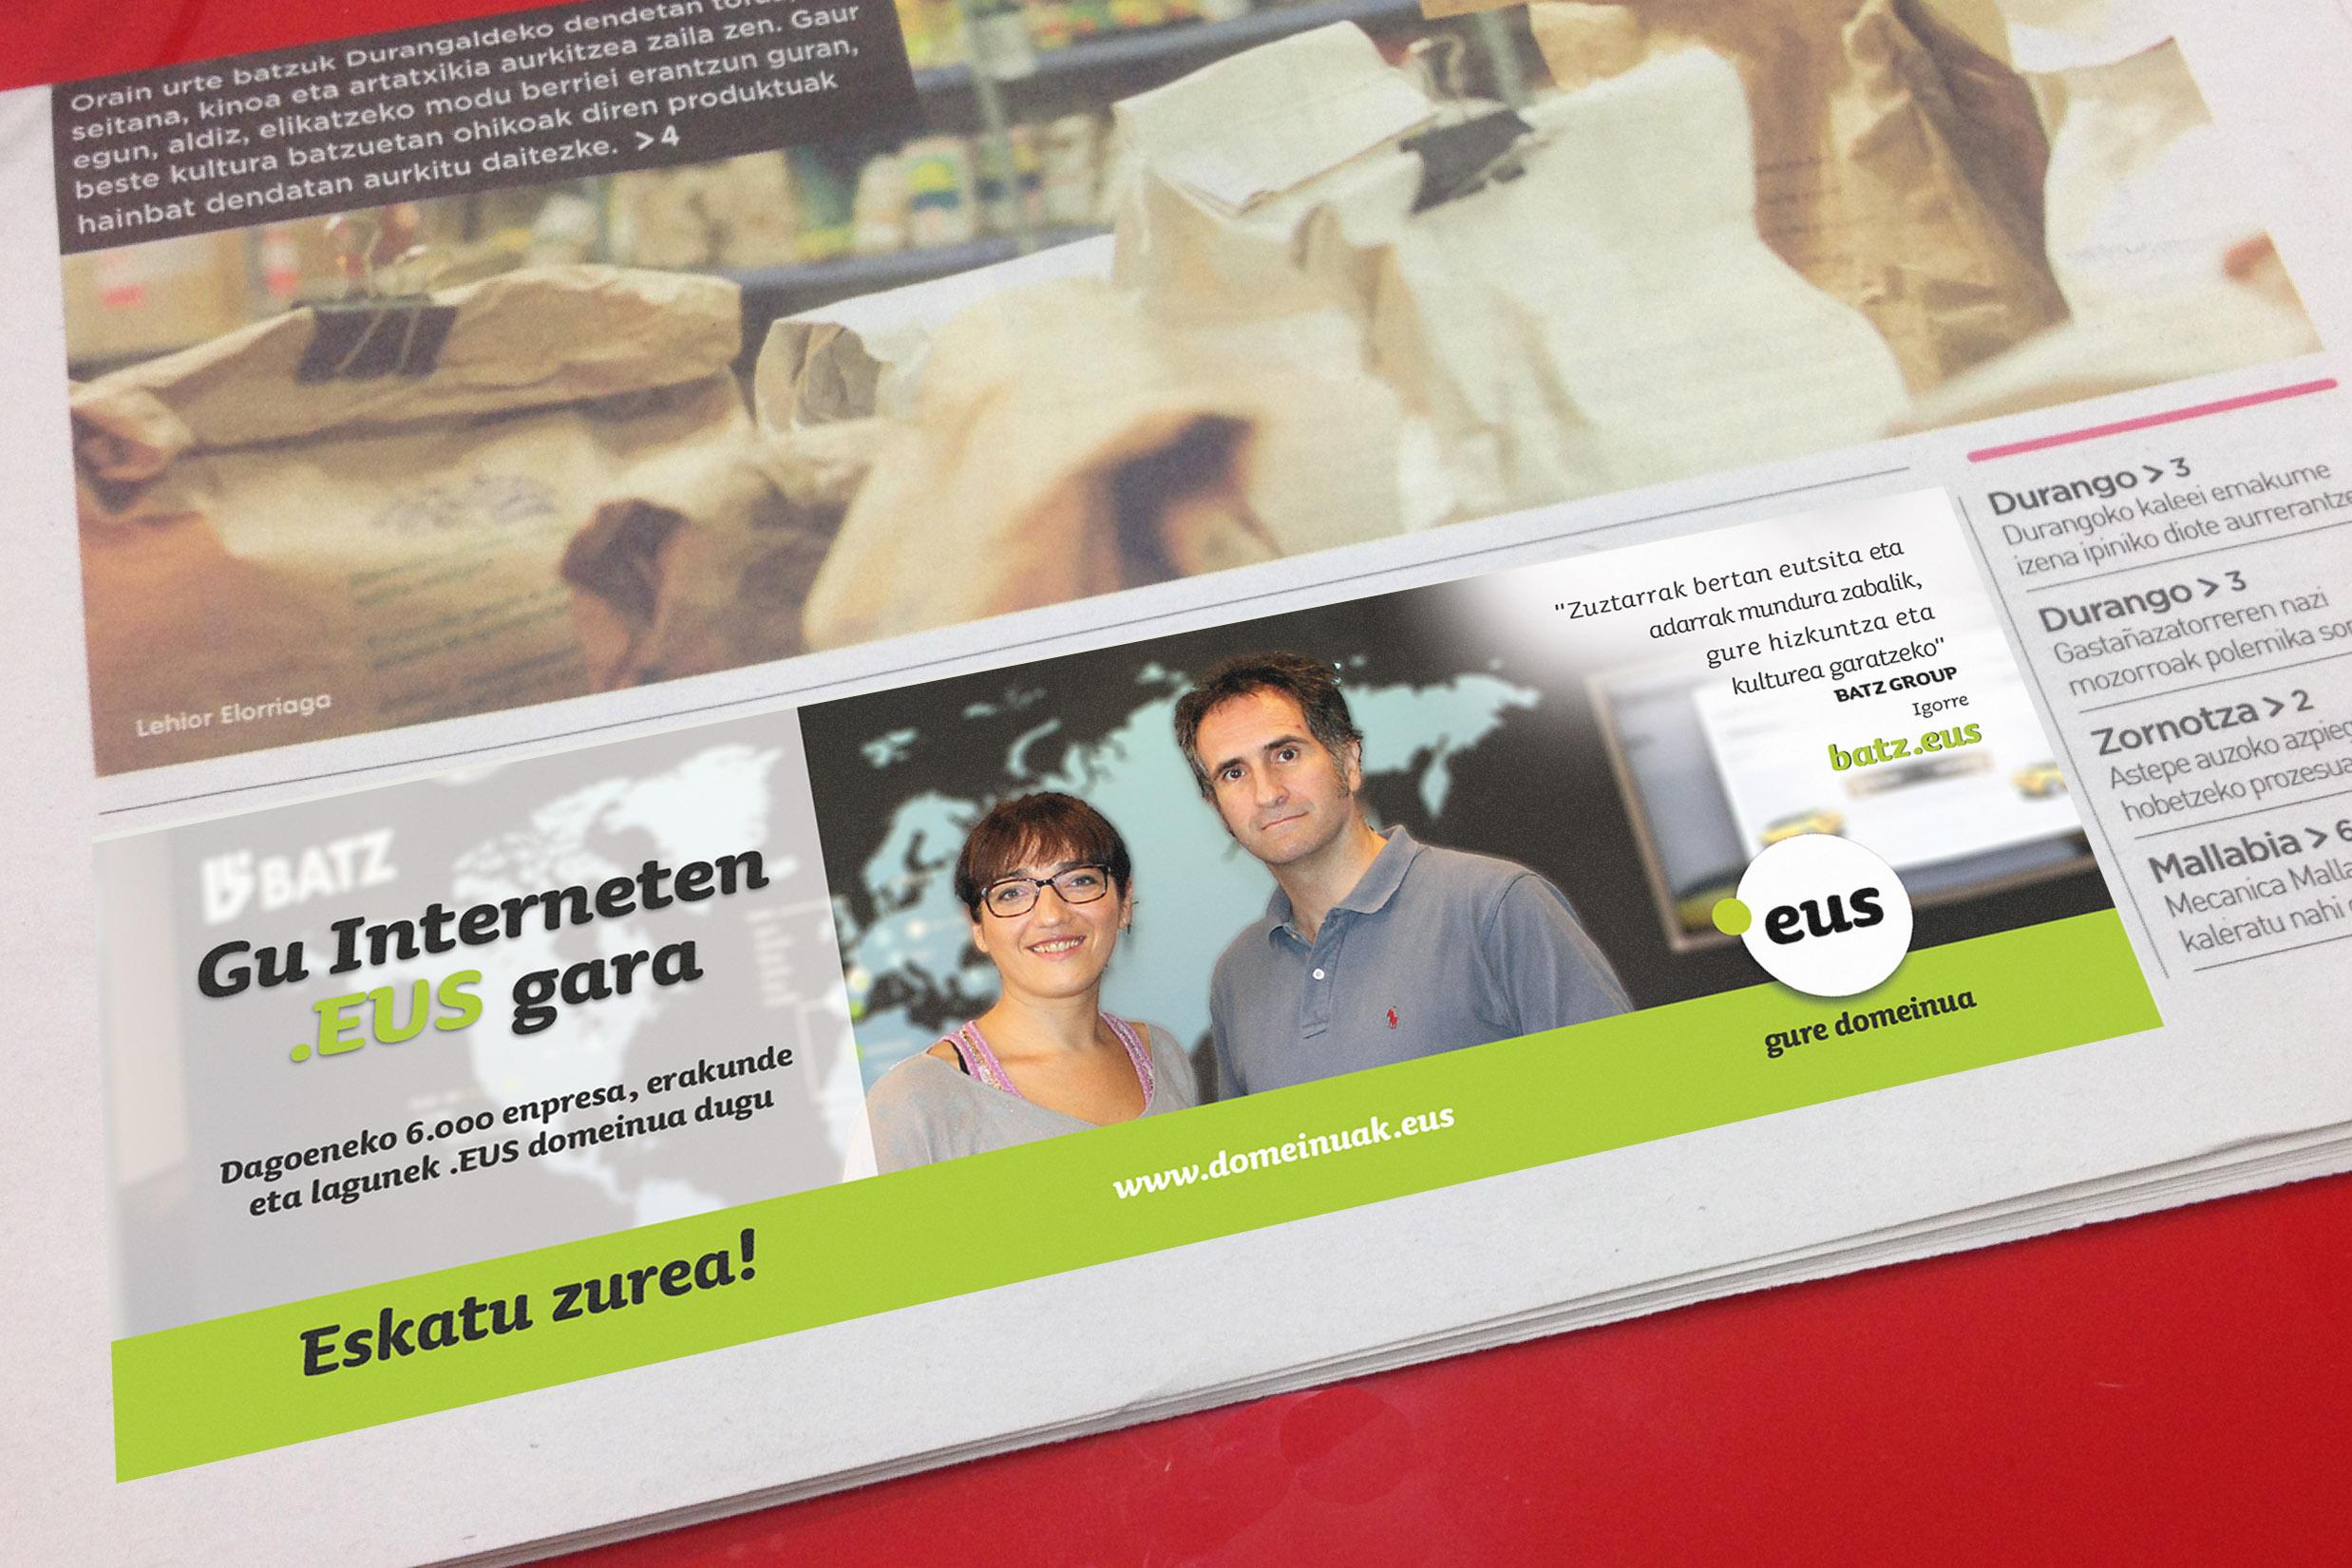 prensa_faldon_puntu eus